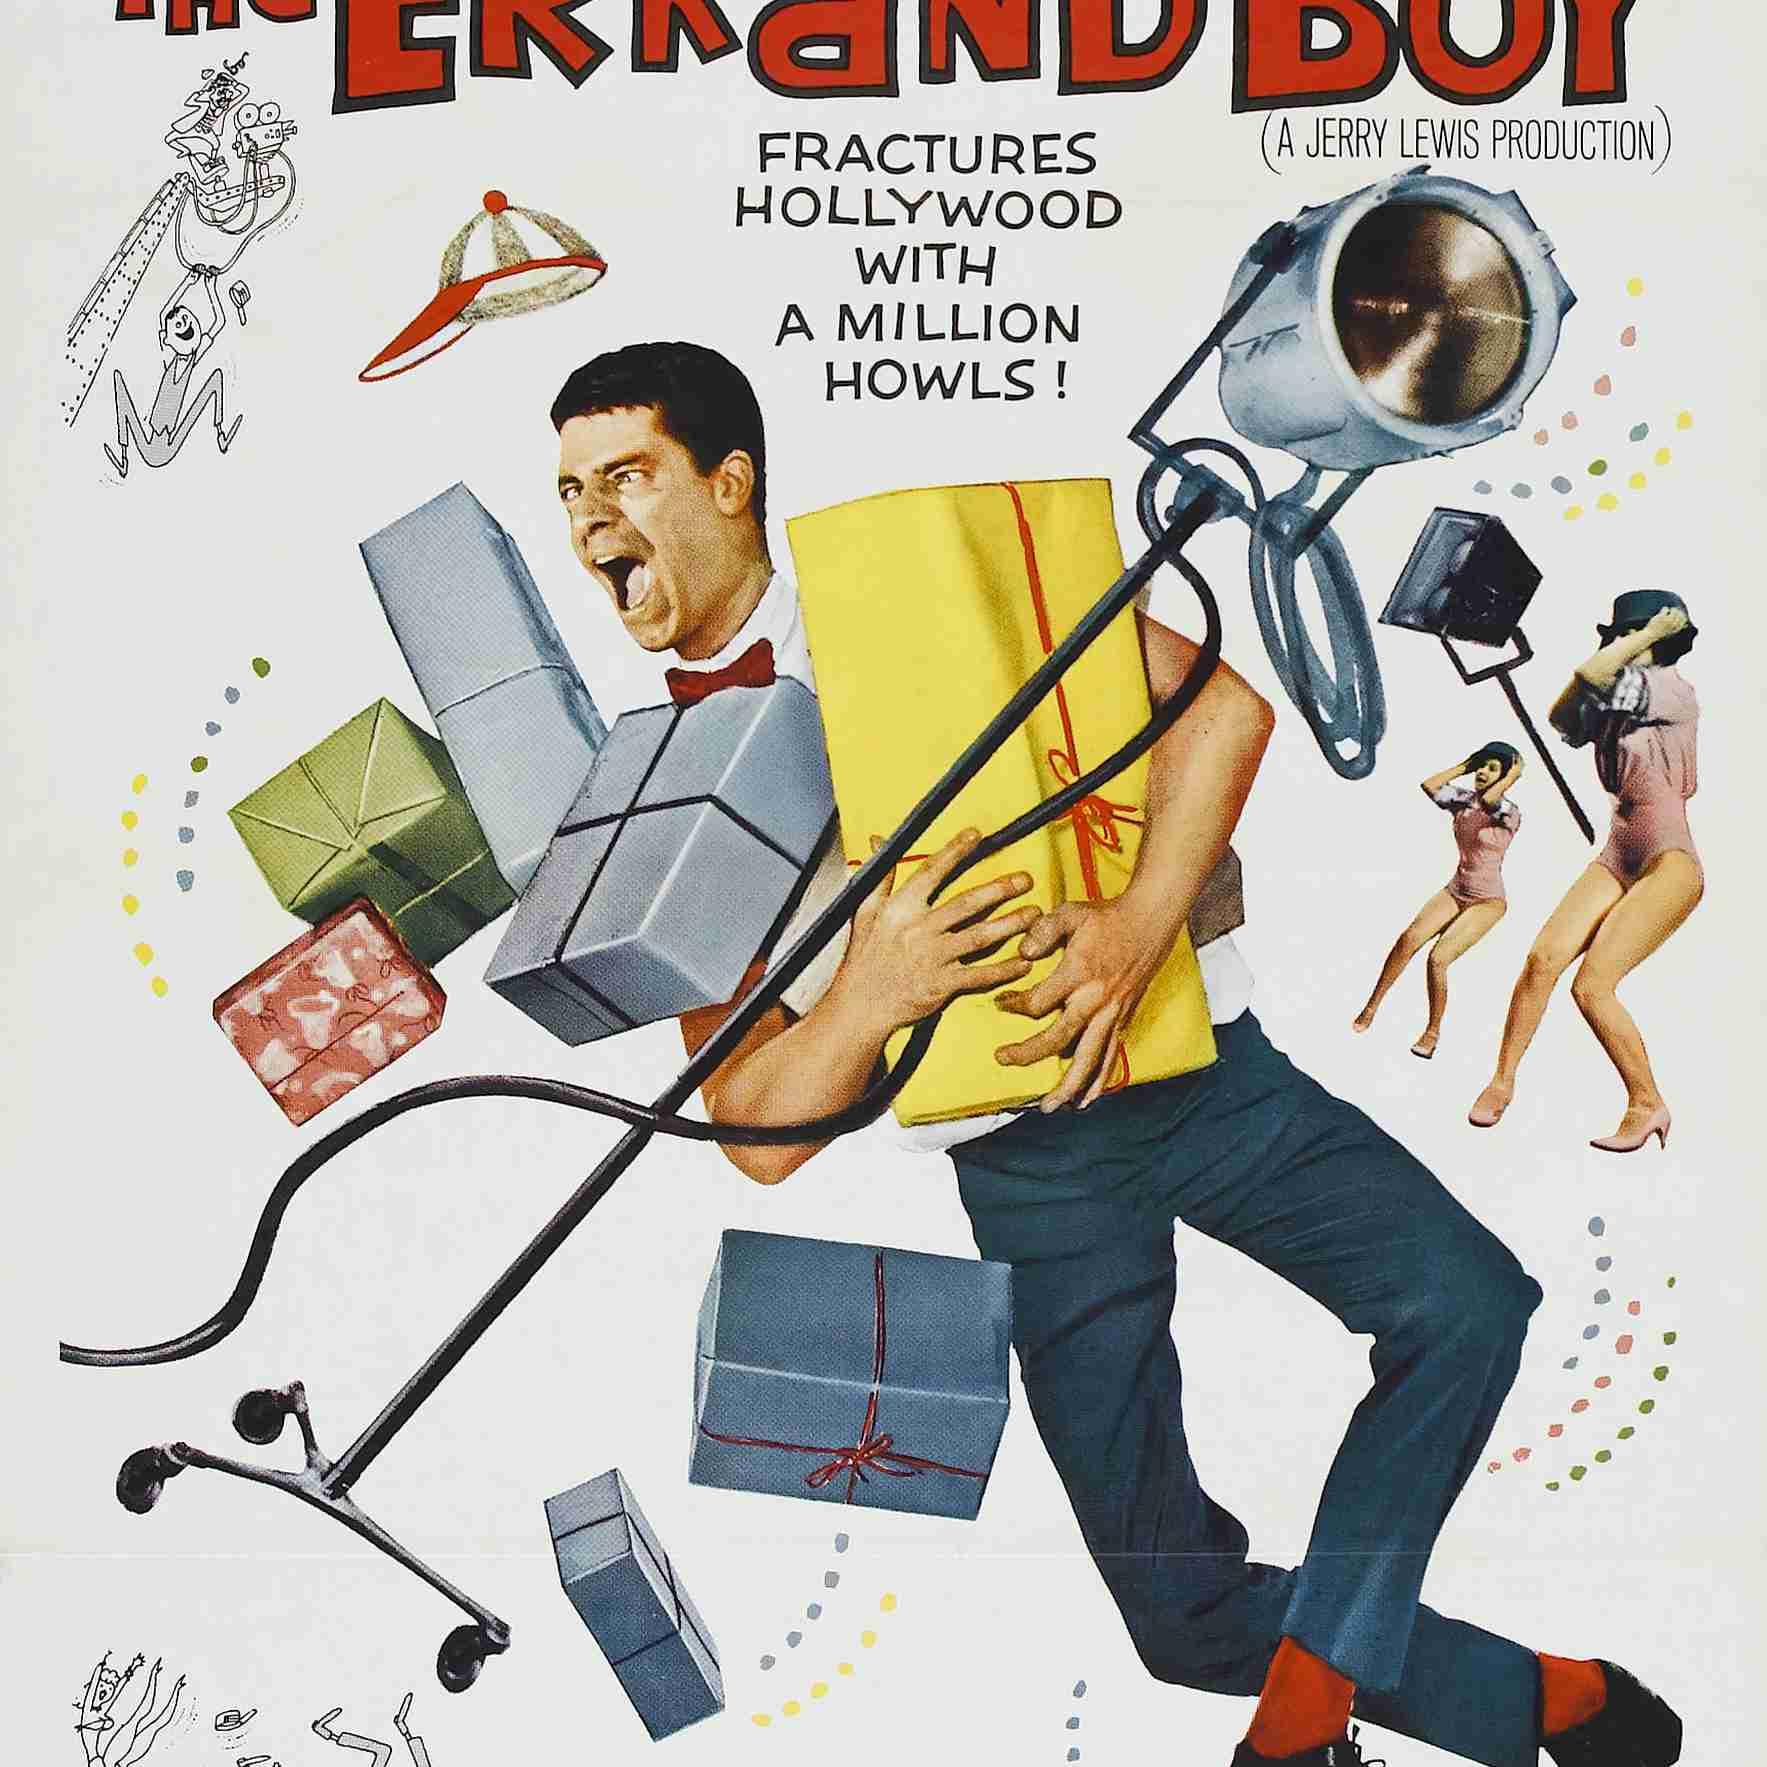 """The Errand Boy"""